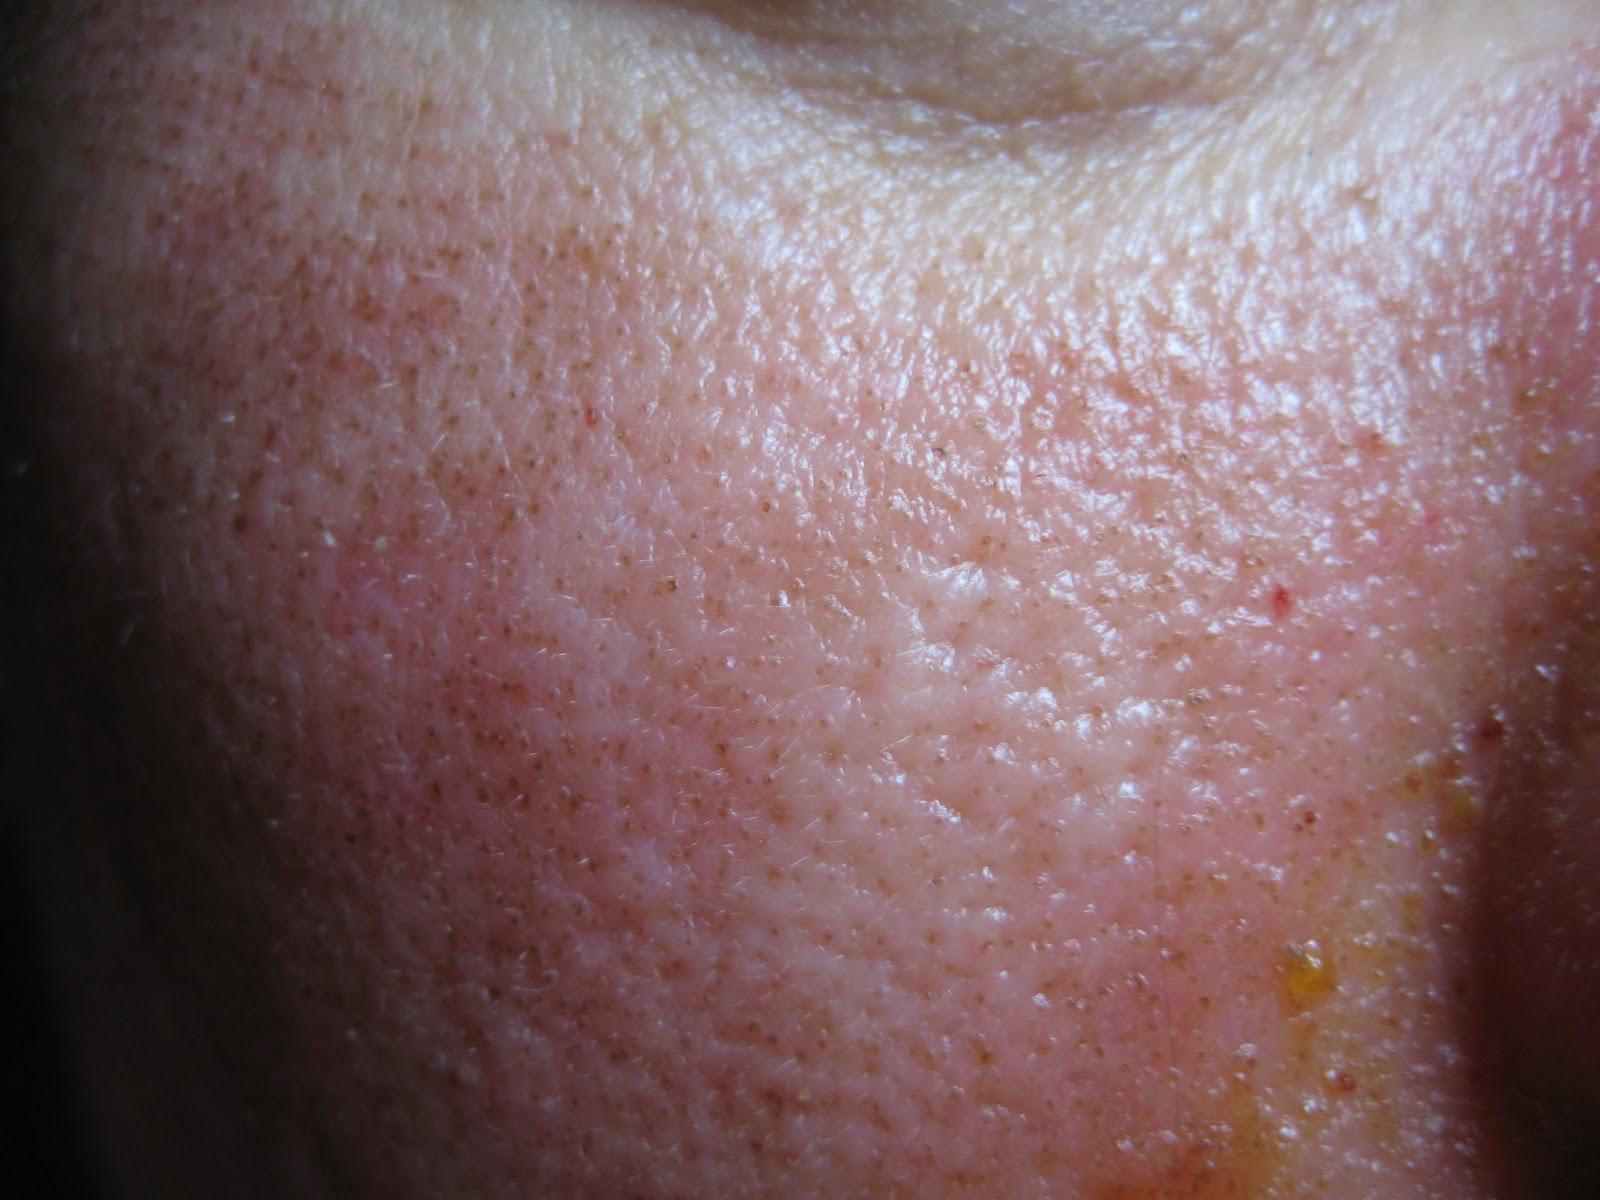 intraductalis papilloma okozza)